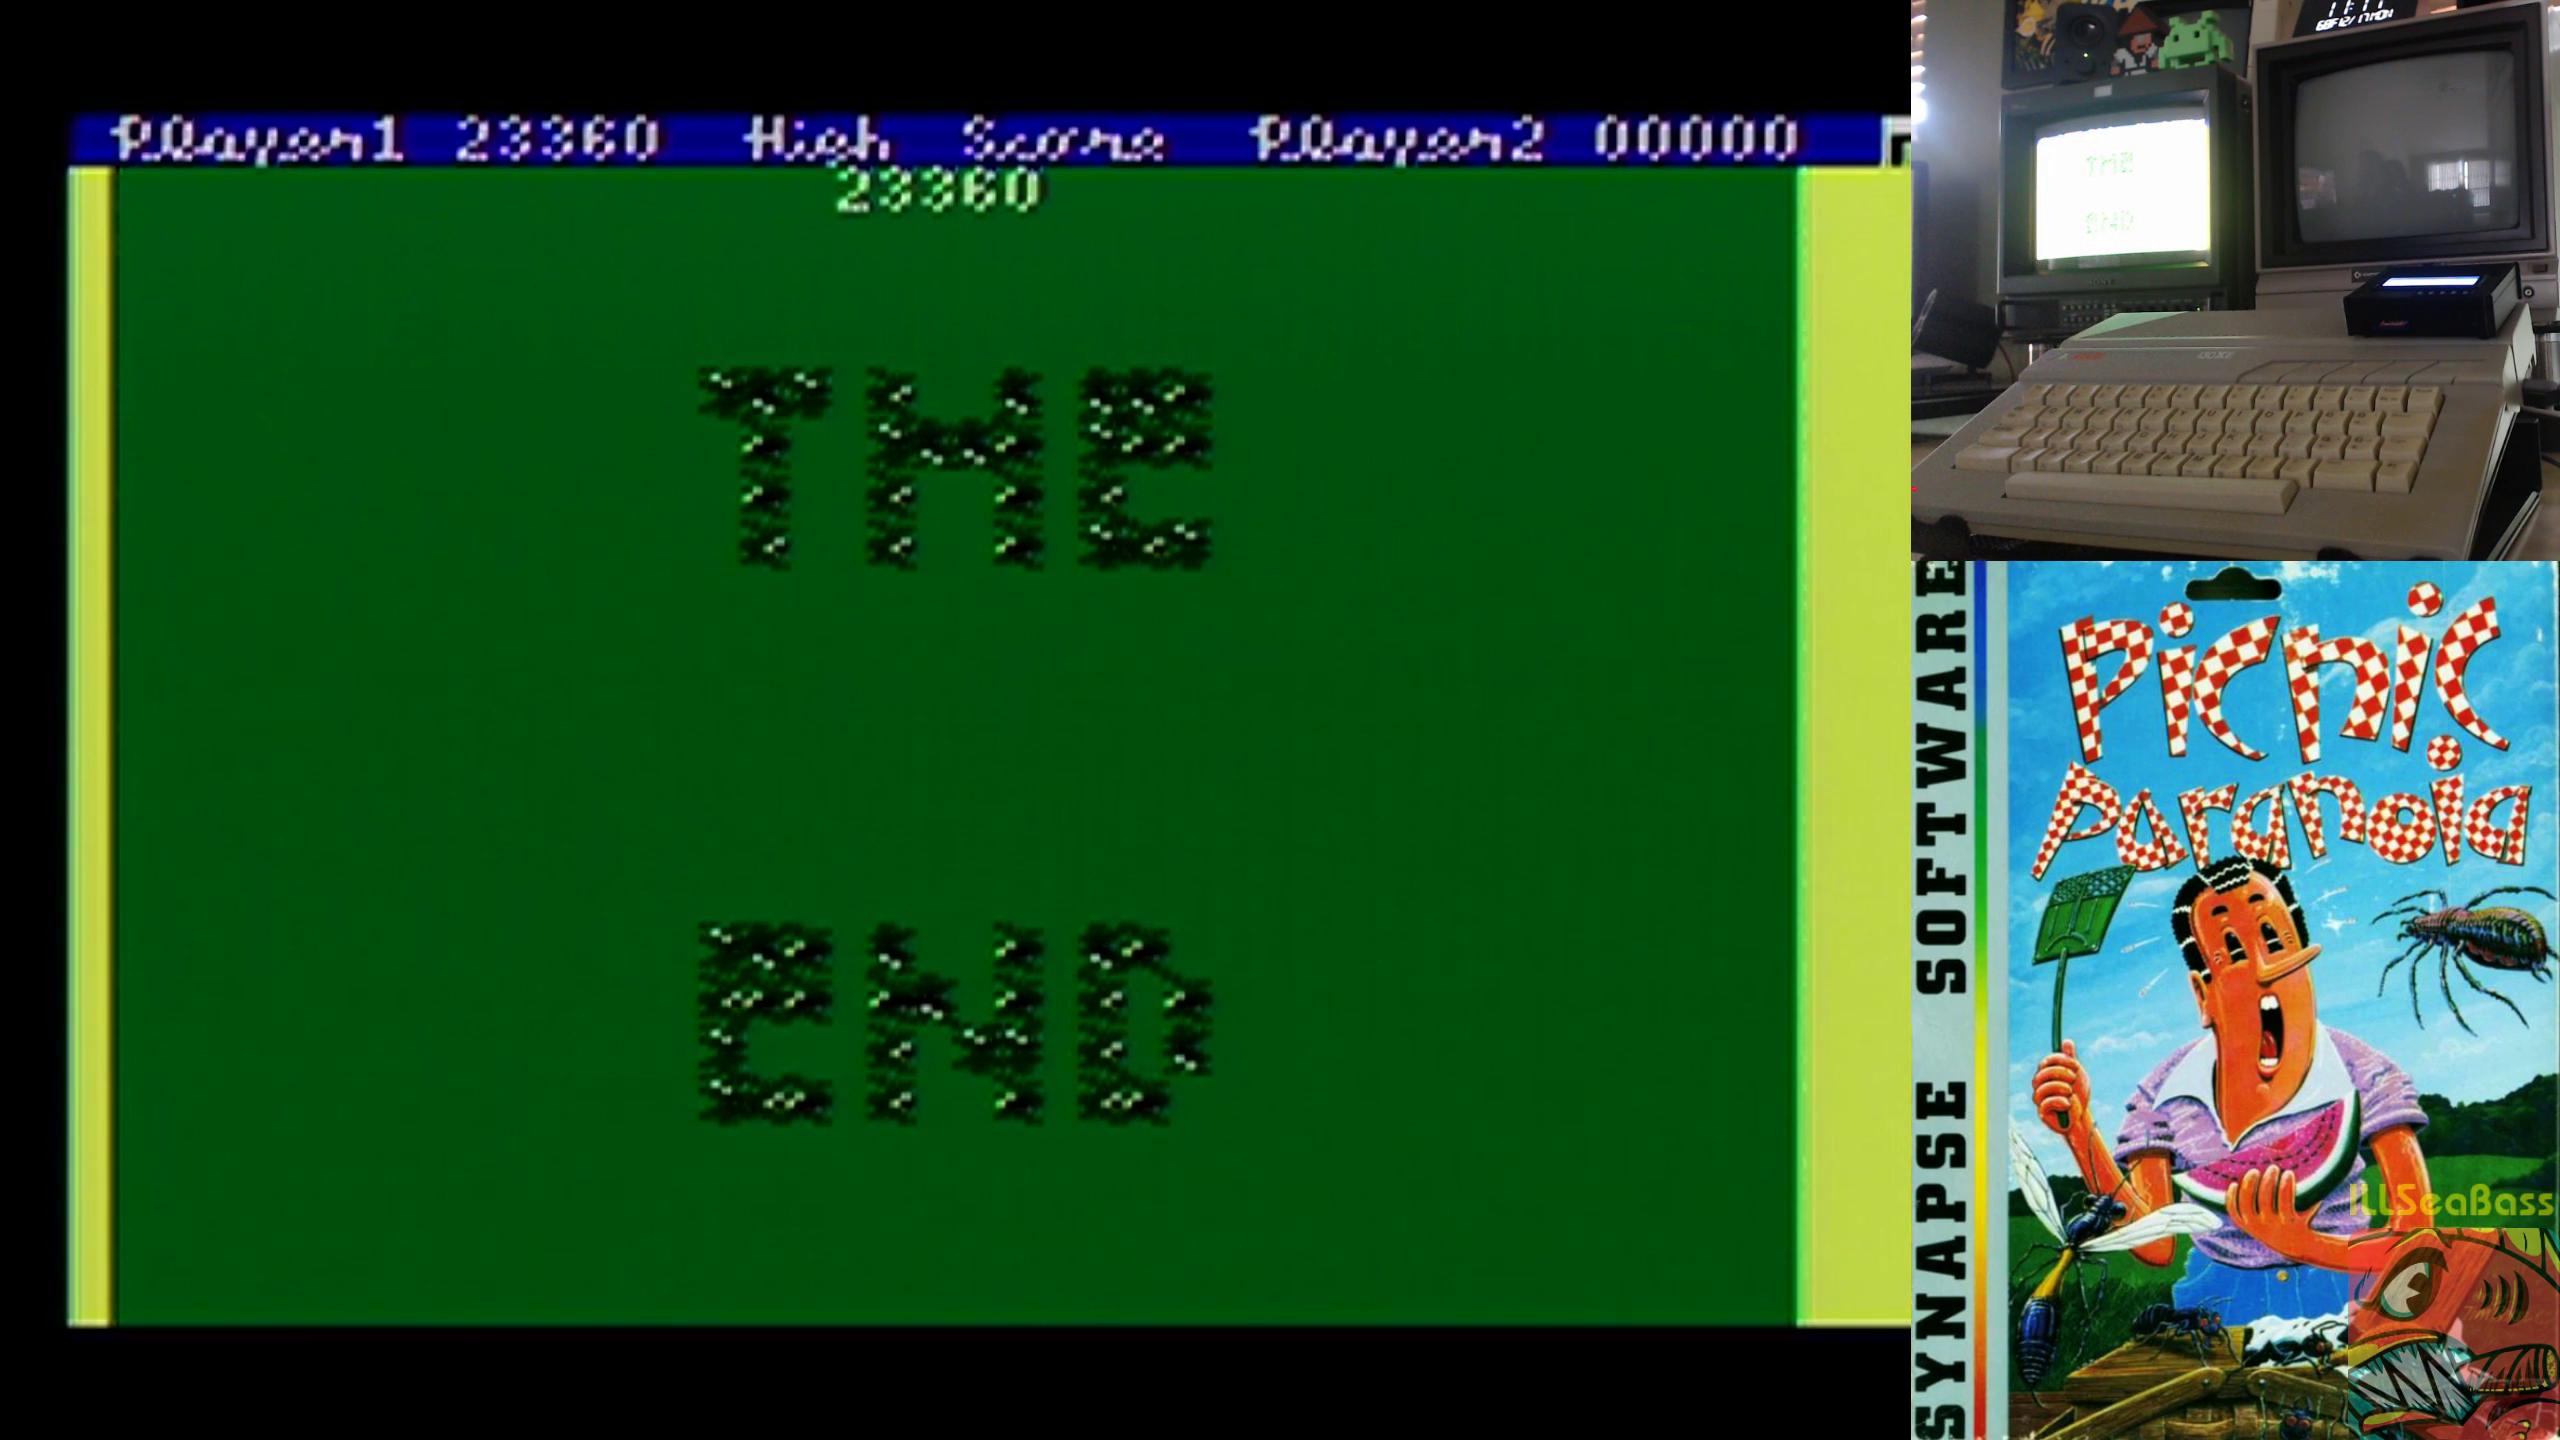 ILLSeaBass: Picnic Paranoia (Atari 400/800/XL/XE) 23,360 points on 2018-12-17 14:37:28